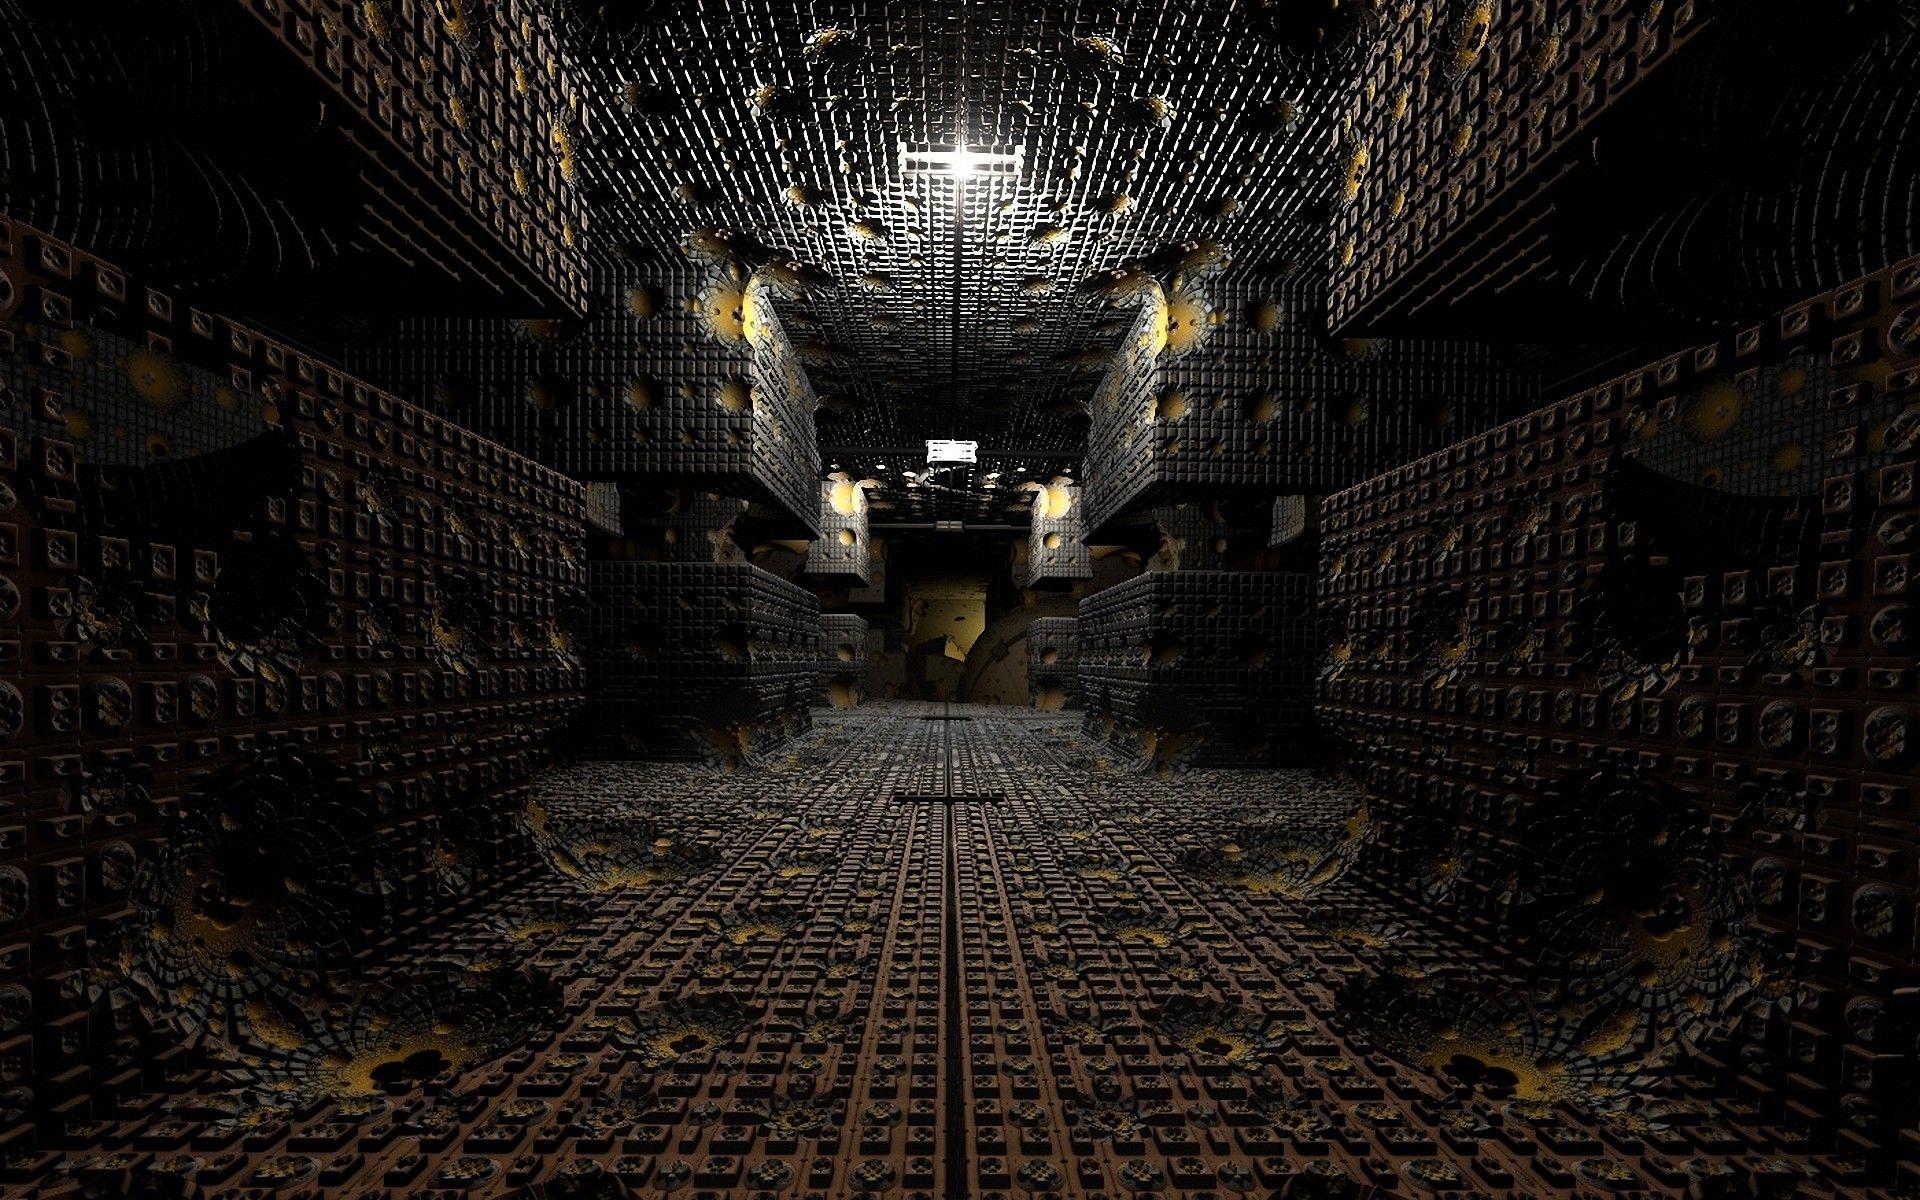 Cgi 3d Abstract Hallway Corridor Fractal Wallpaper Fractals Black Hole Wallpaper High Resolution Wallpapers